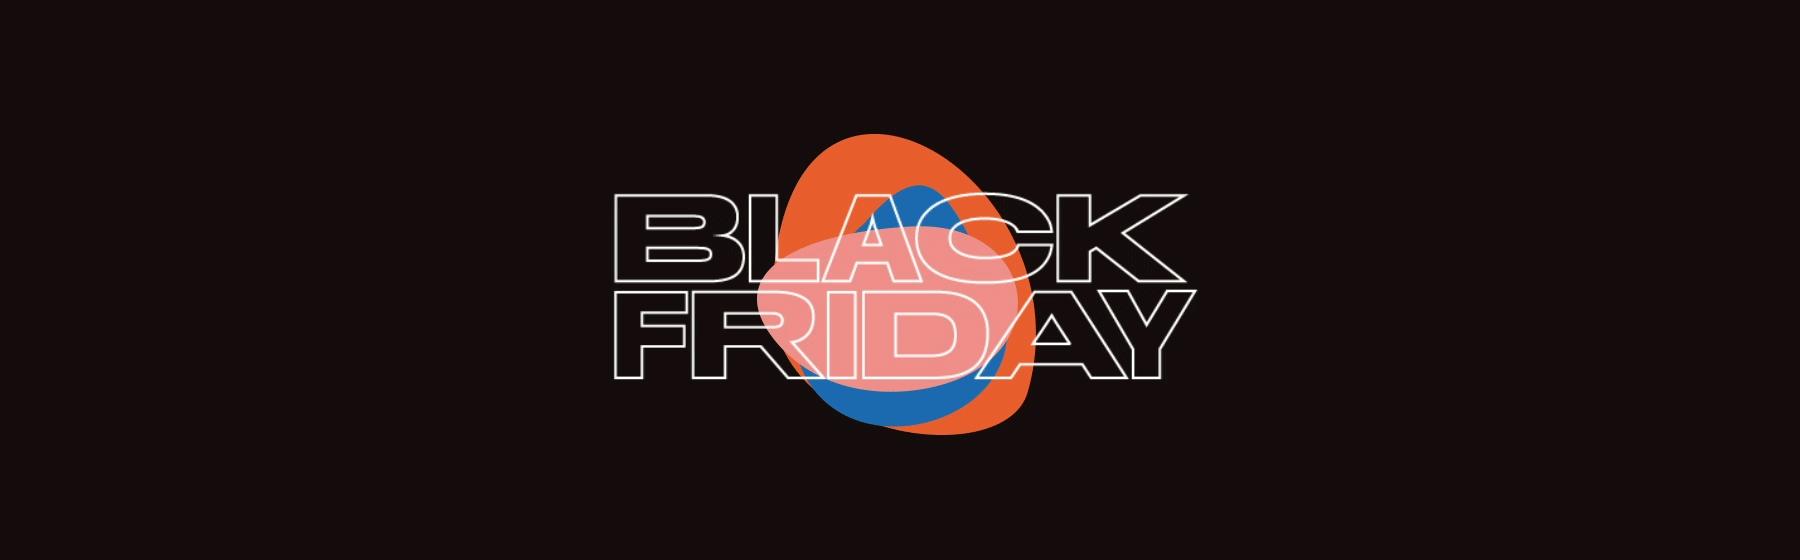 Black Friday 2019: Schuhe und Accessoires  Offizieller